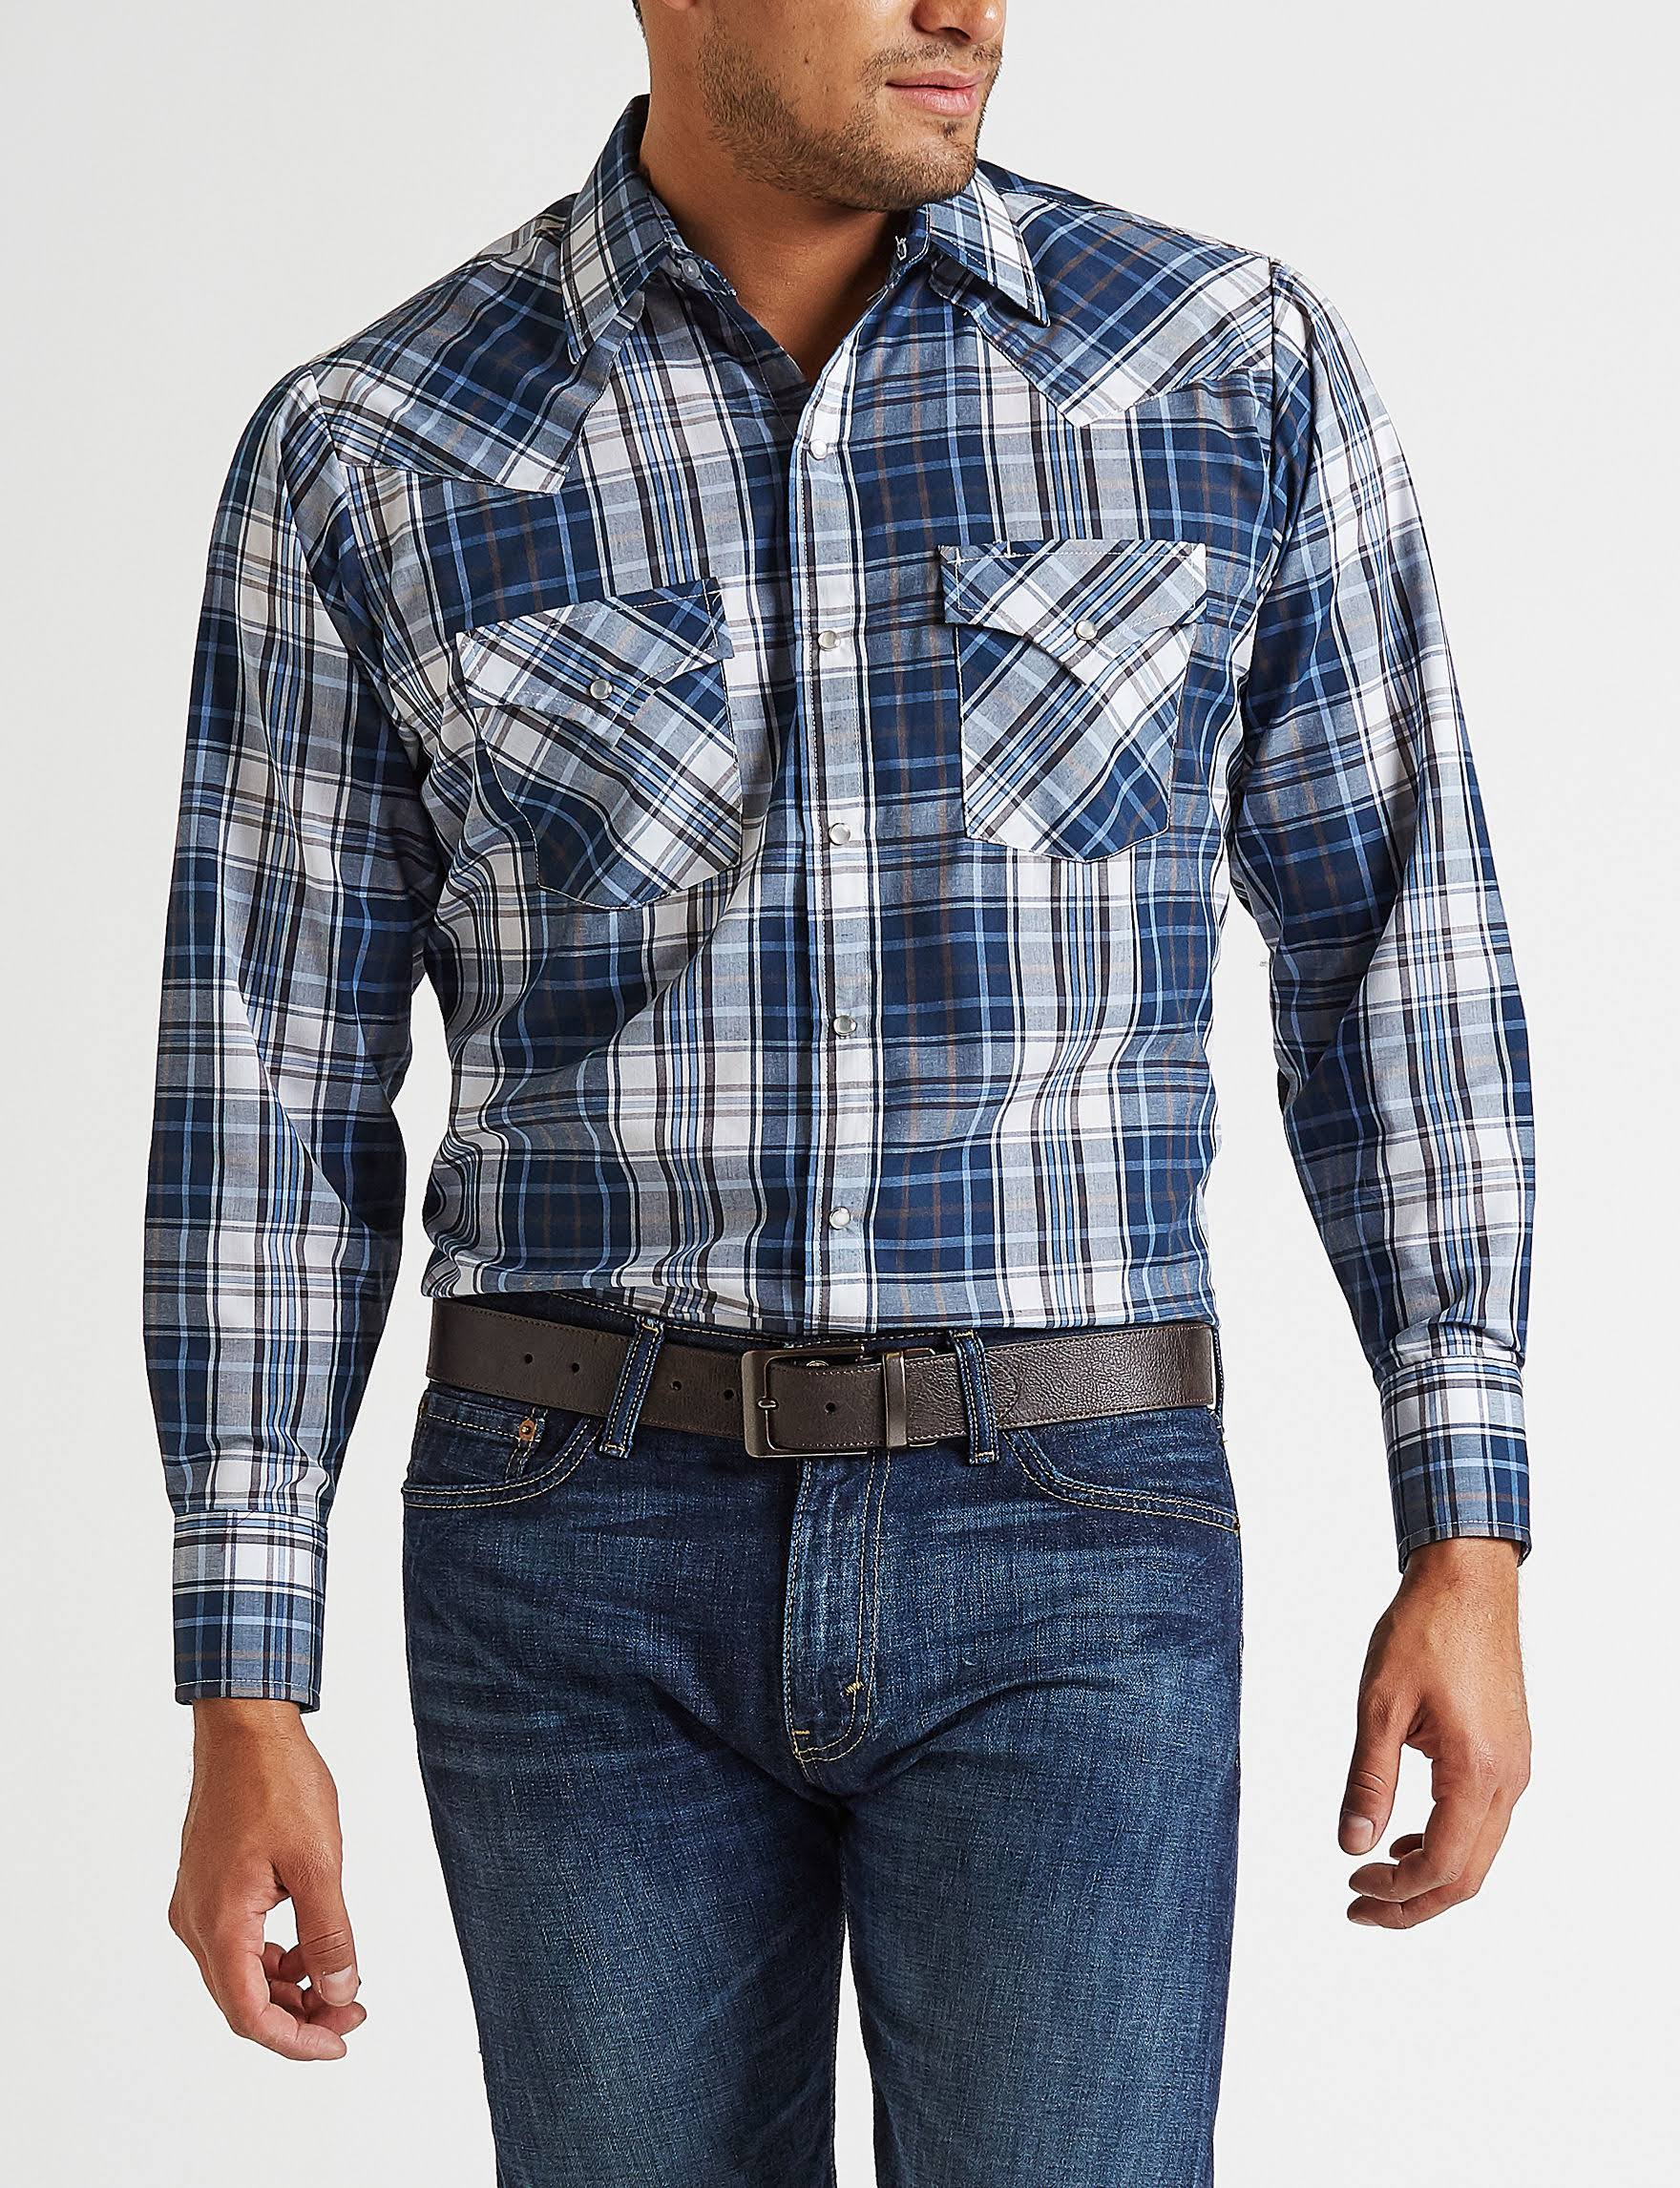 Cattleman Tiendas Ely Shirt Las Western Plaid Stage En Size Woven S Blue drIavxrqw